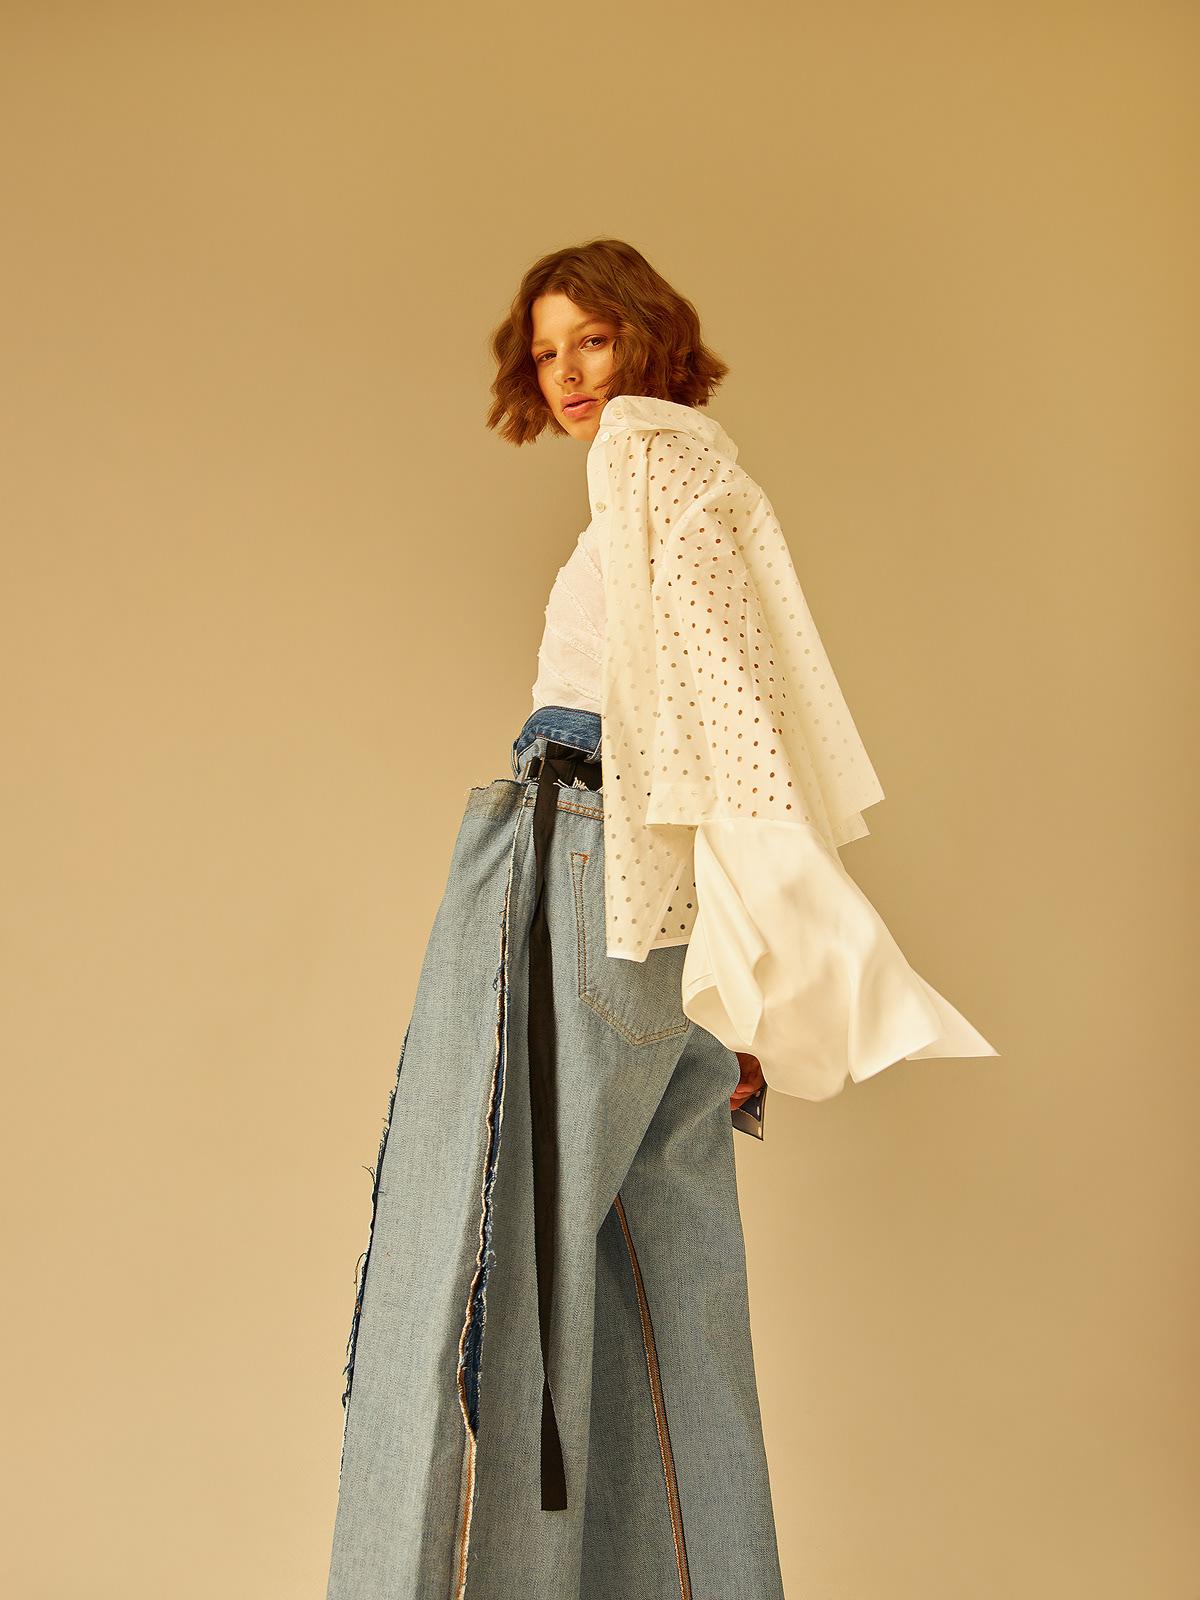 Image may contain: dress, wall and clothing